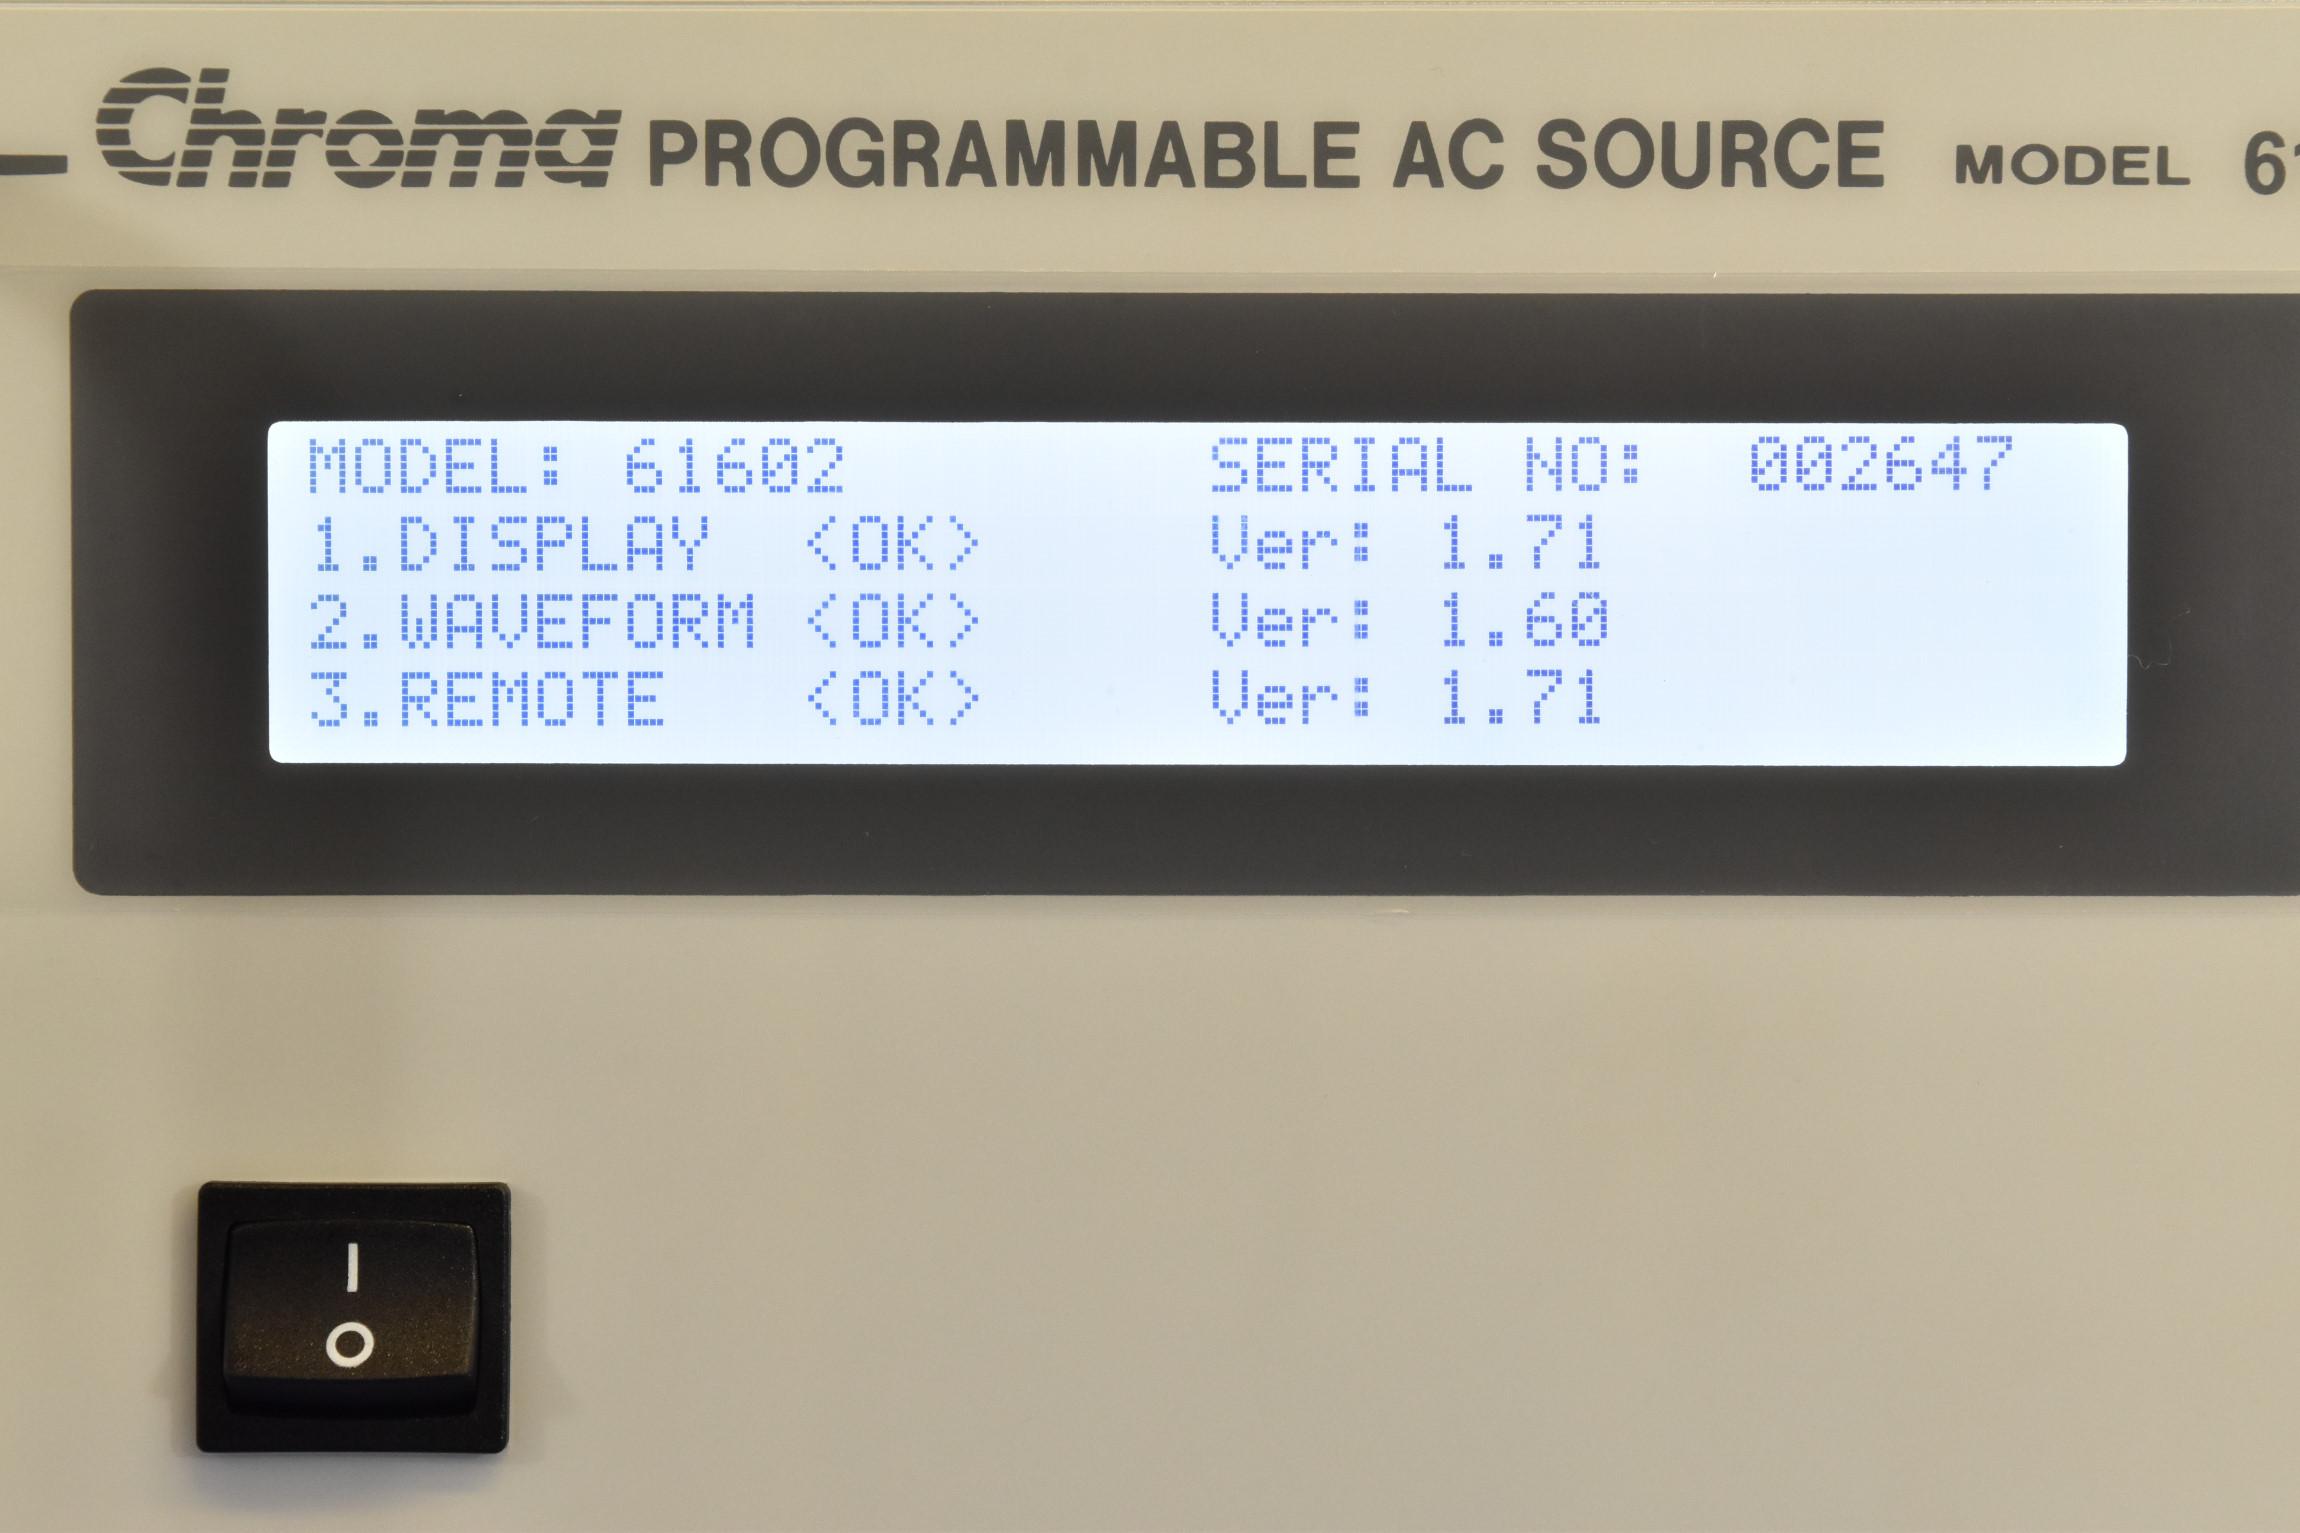 SN 956_004